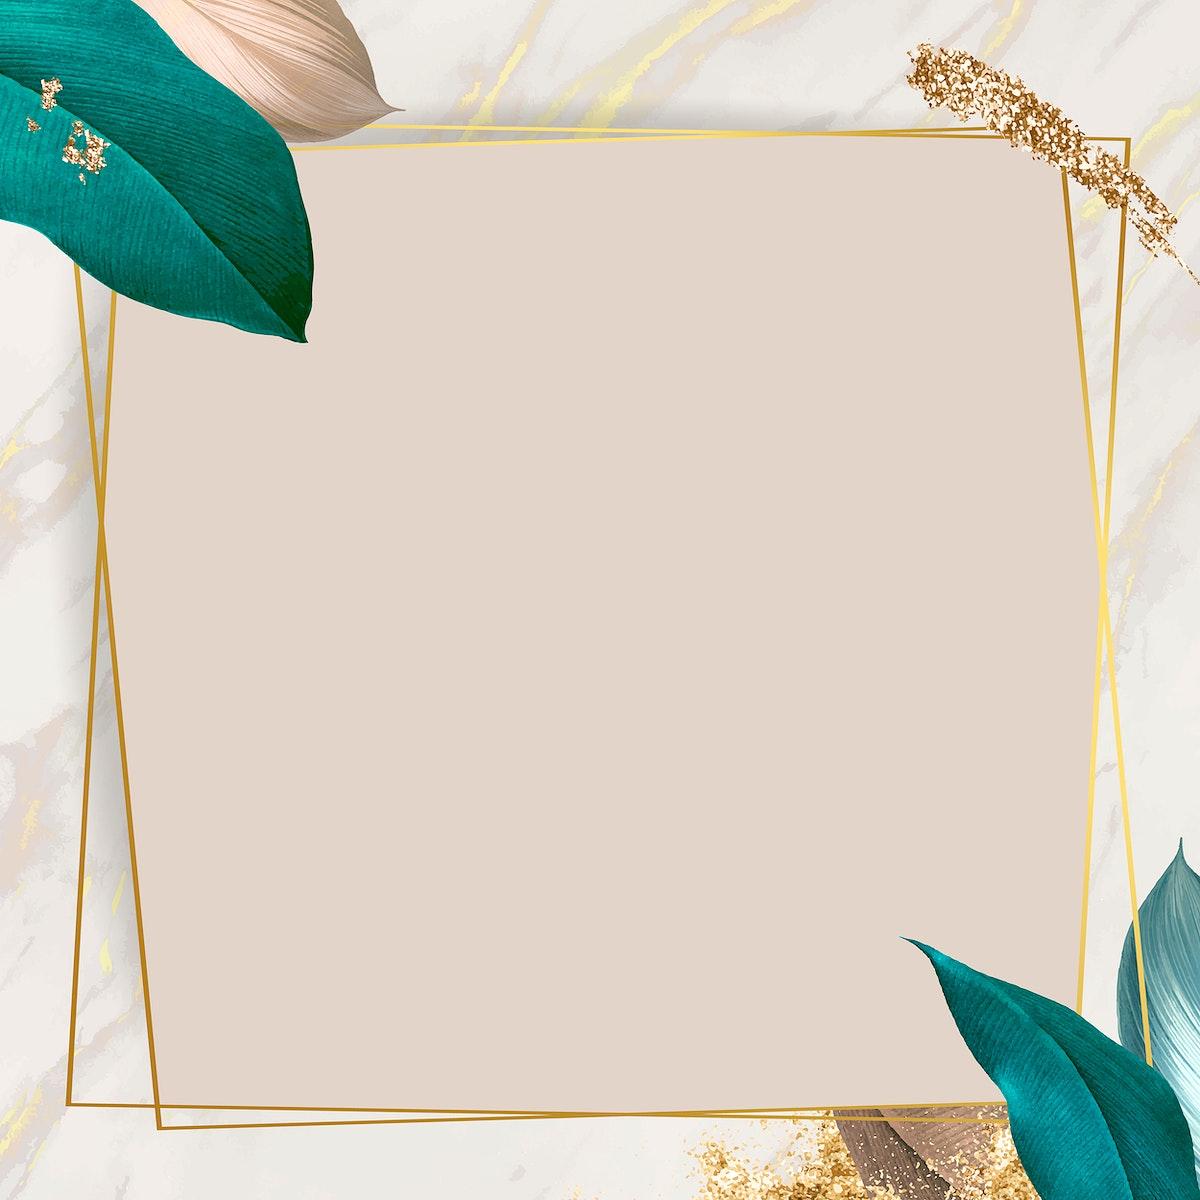 Botanical rectangle frame design vector